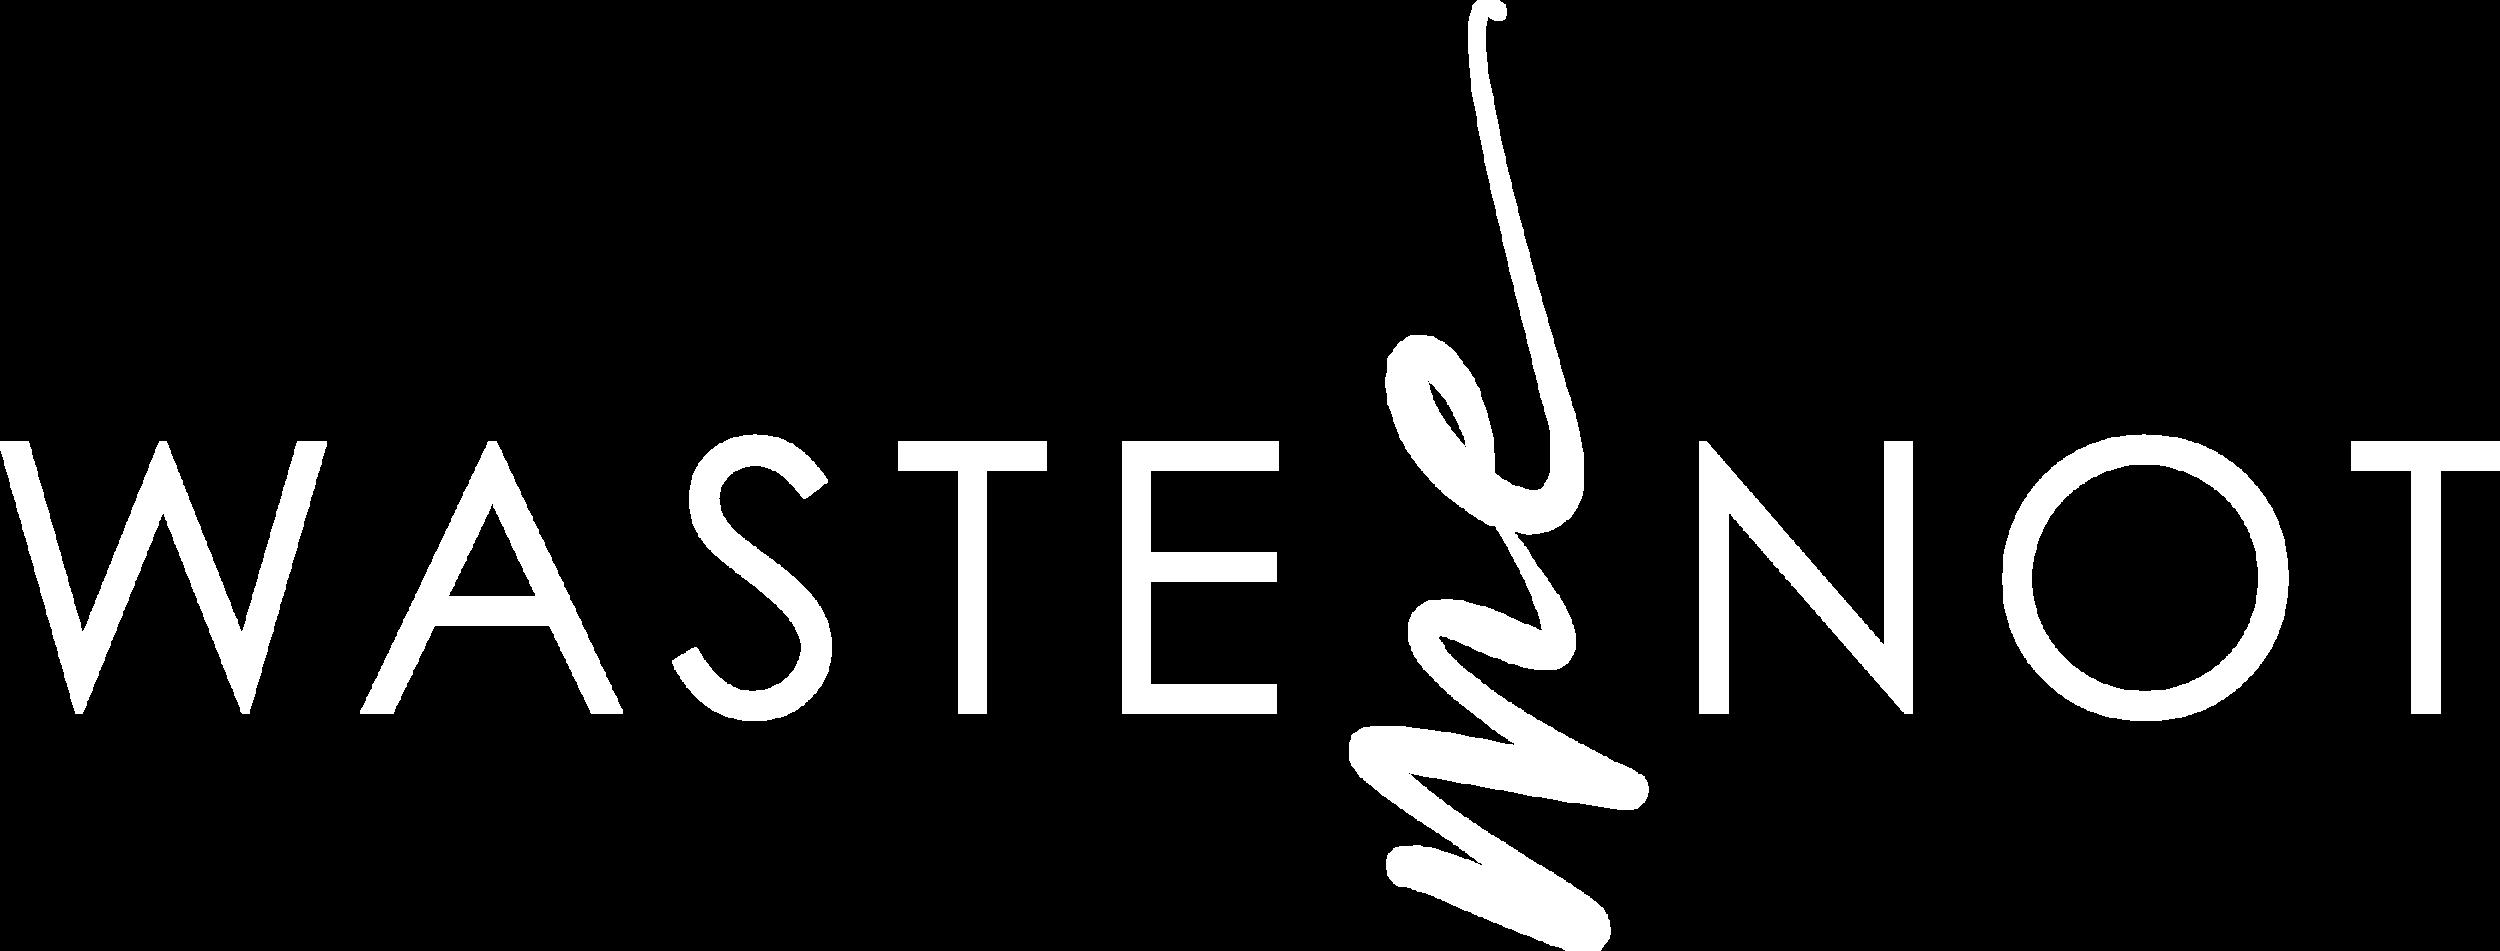 WasteMeNot.png